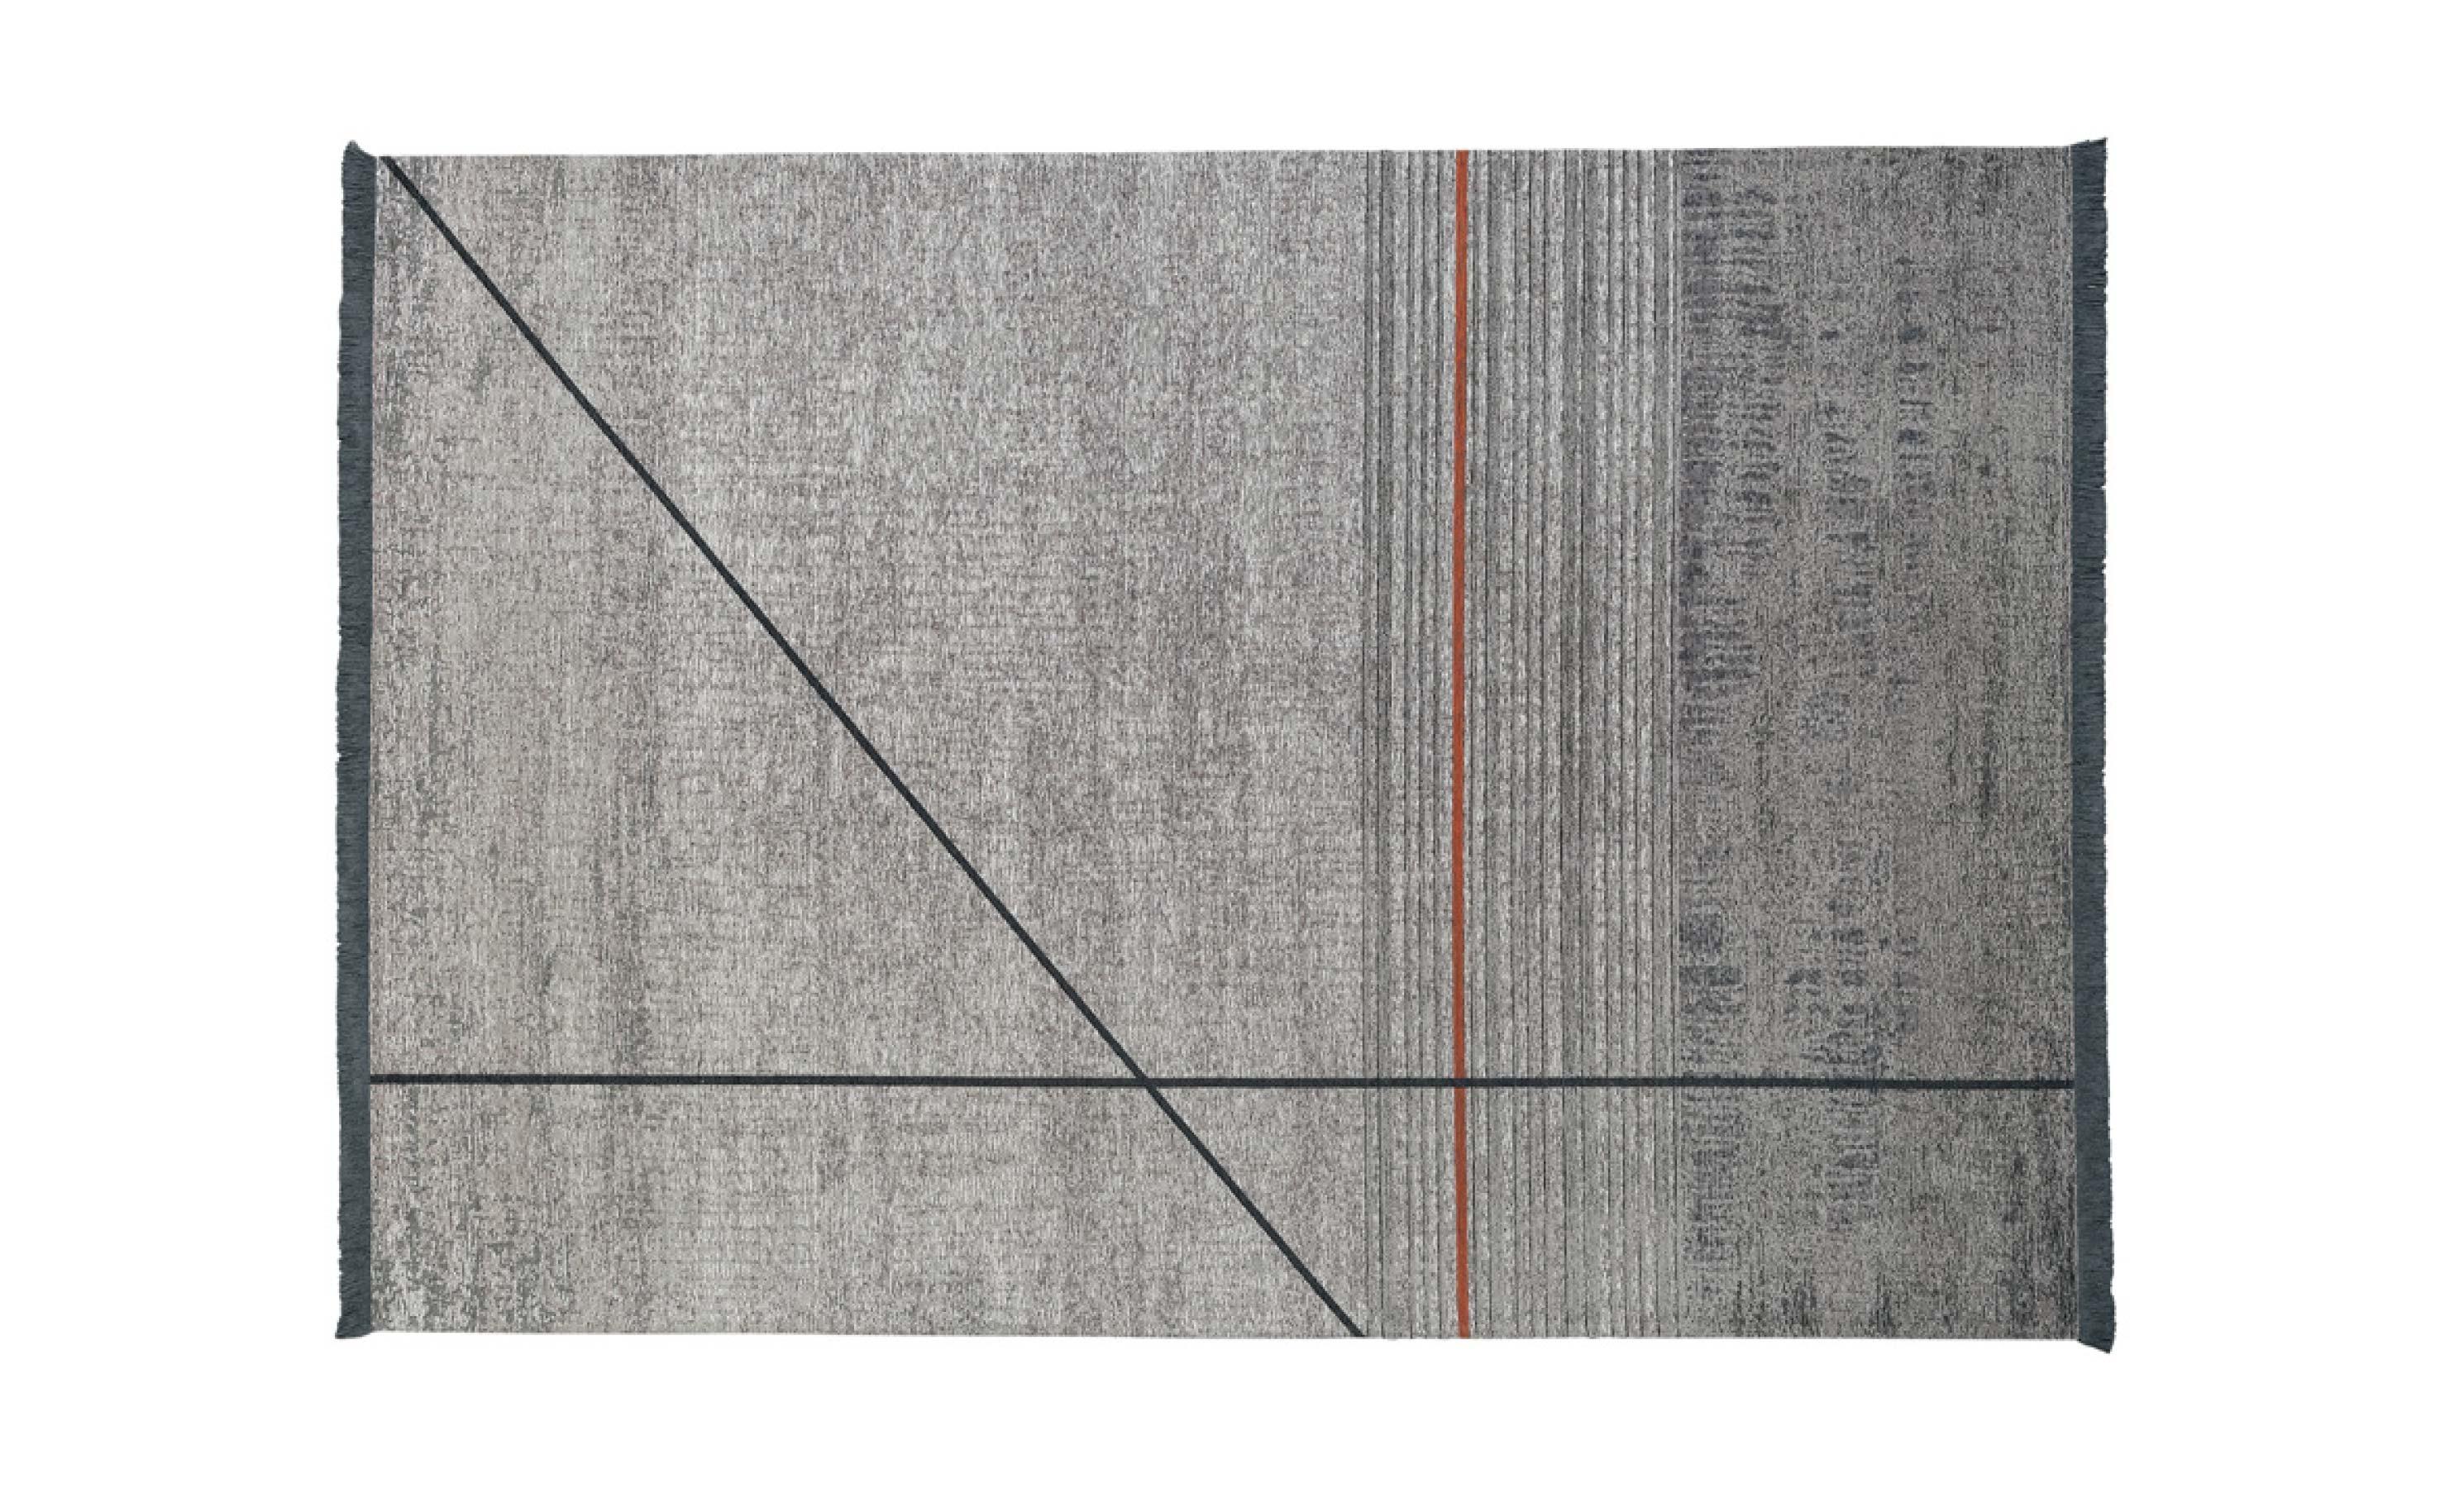 http://desidea.hu/wp-content/uploads/2019/11/tappeto-rug-diagonal.jpg